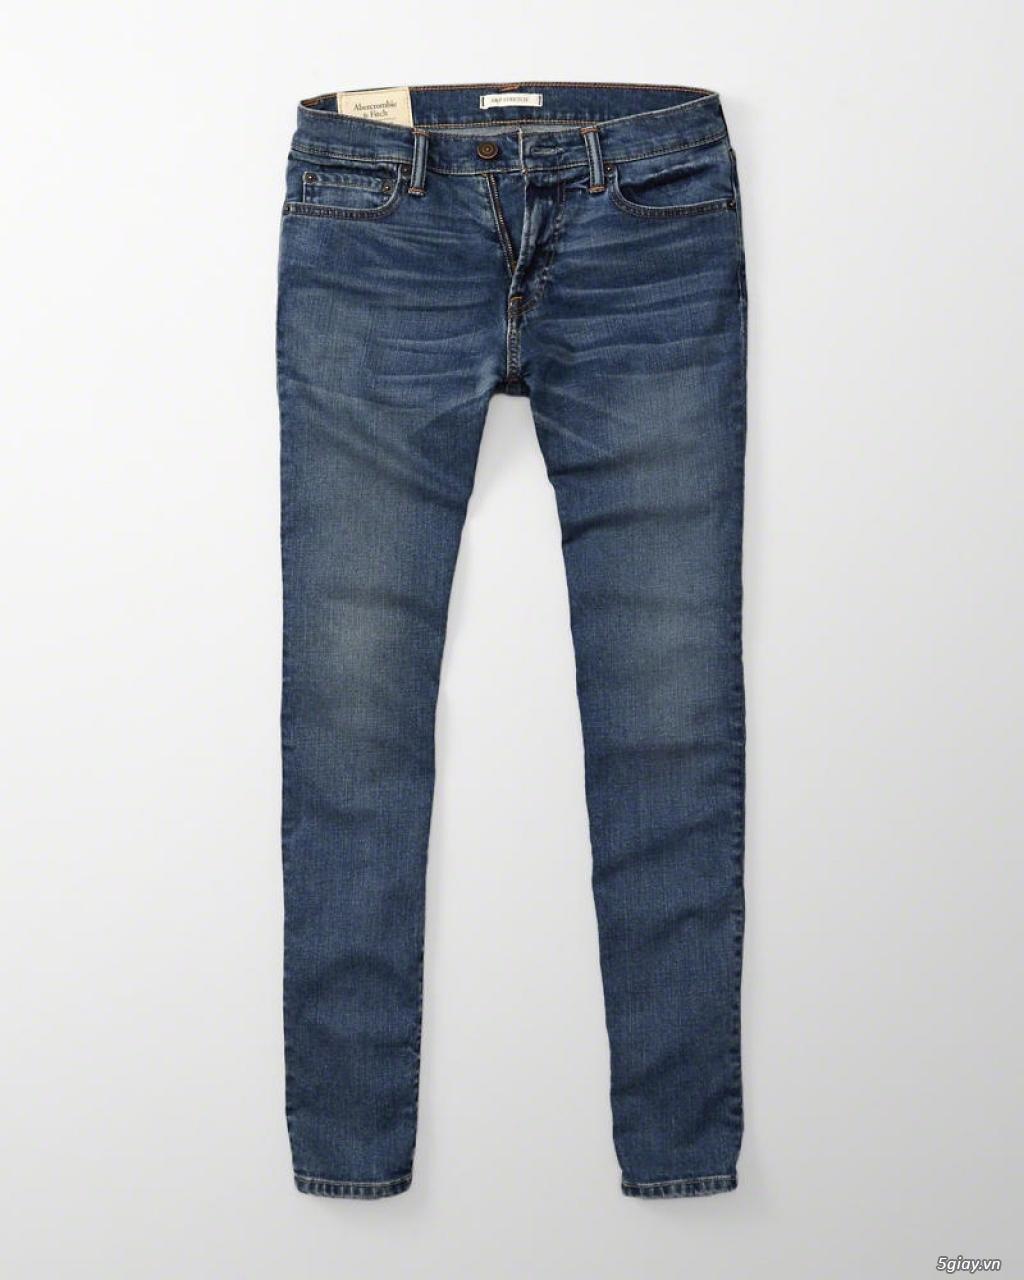 [ Lamanshop.com ]- Quần áo HOLLISTER - ABERCROMBIE & FITCH - Chính hãng USA 100% - 9